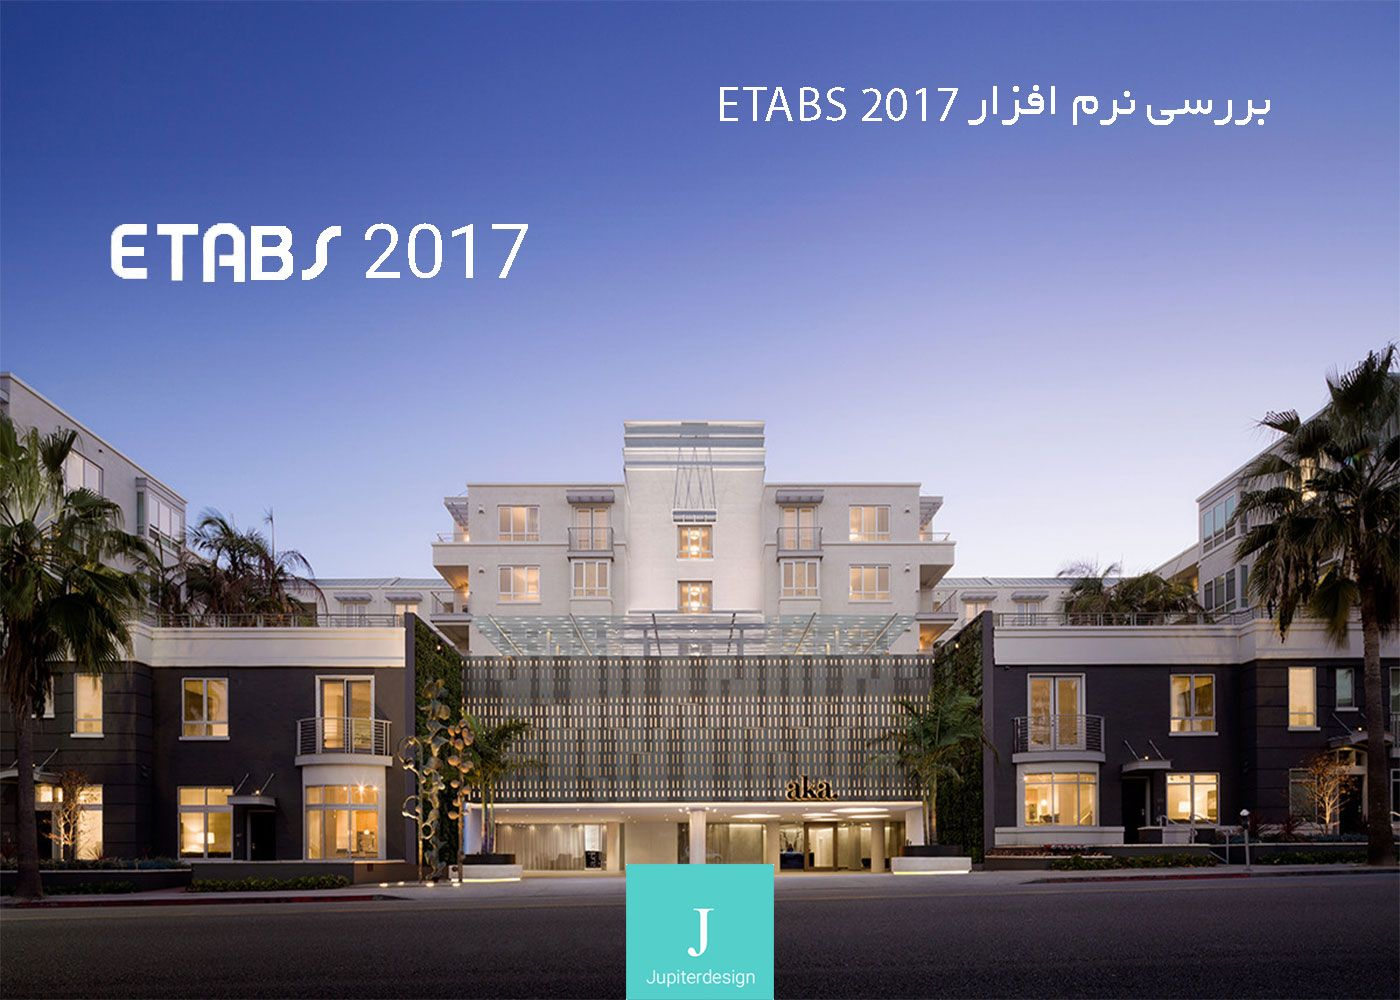 ایتبس ایتبس2017 ایتبس2016 Csi Etabs Etabs2017 Etabs2016 ویژگی های ایتبس ۲۰۱۷ چیست Los Angeles Hotels Beverly Hills Apartment Beverly Hills